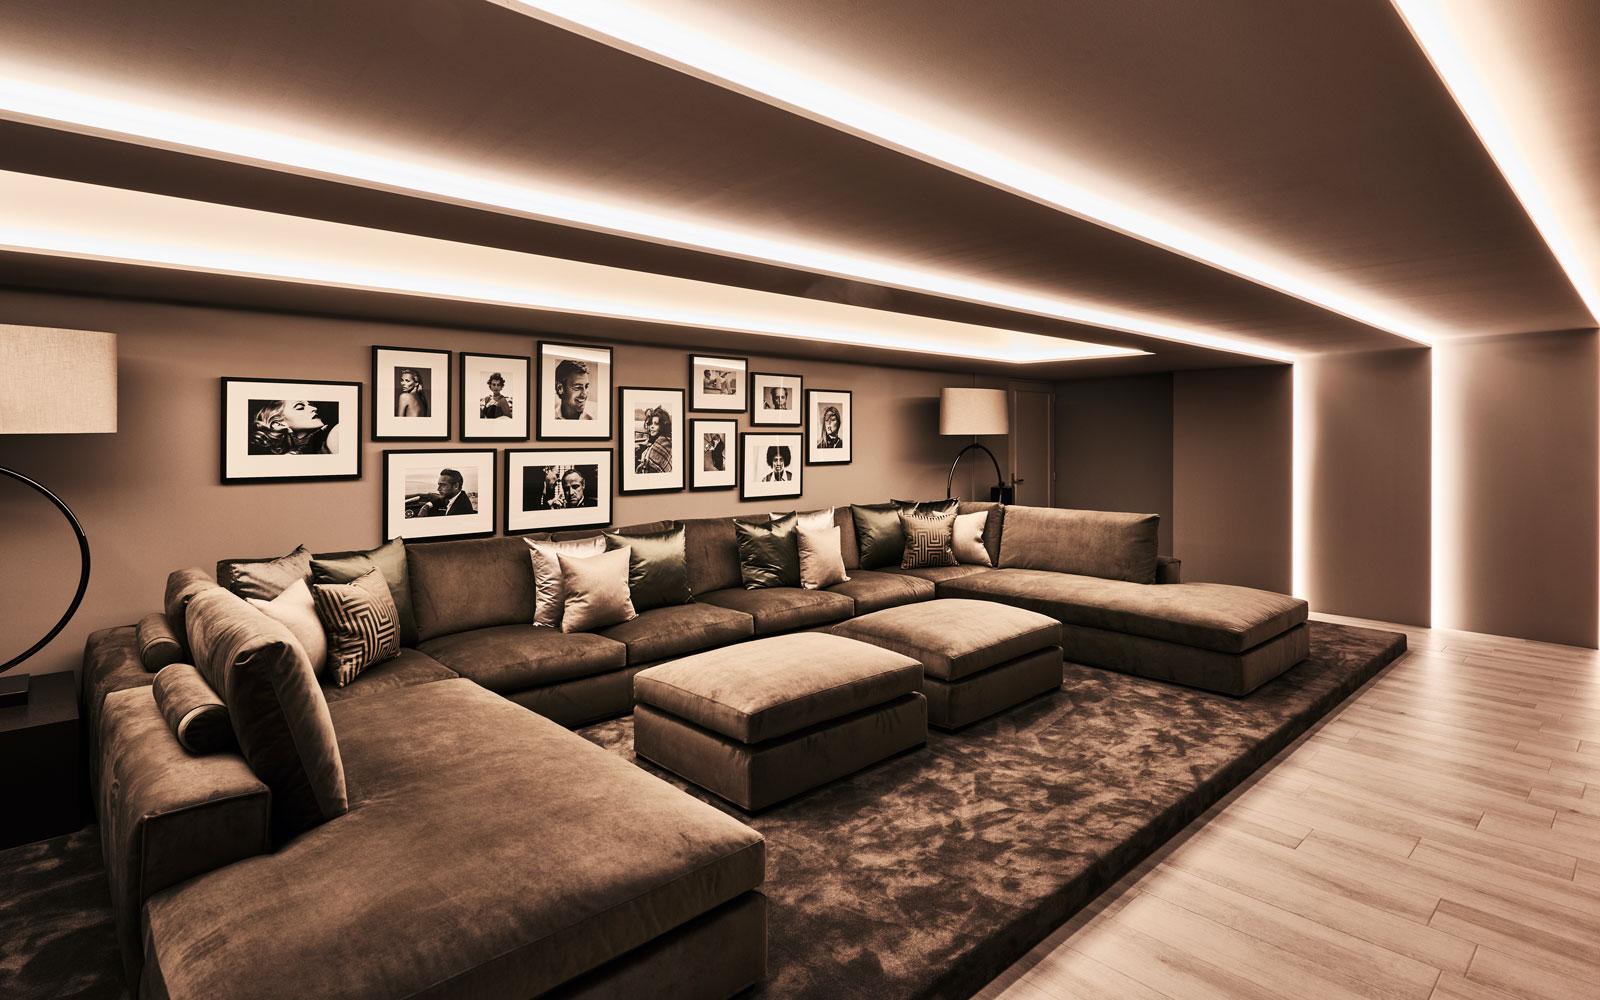 lichtplan, maretti lighting, eric kuster, metropolitan